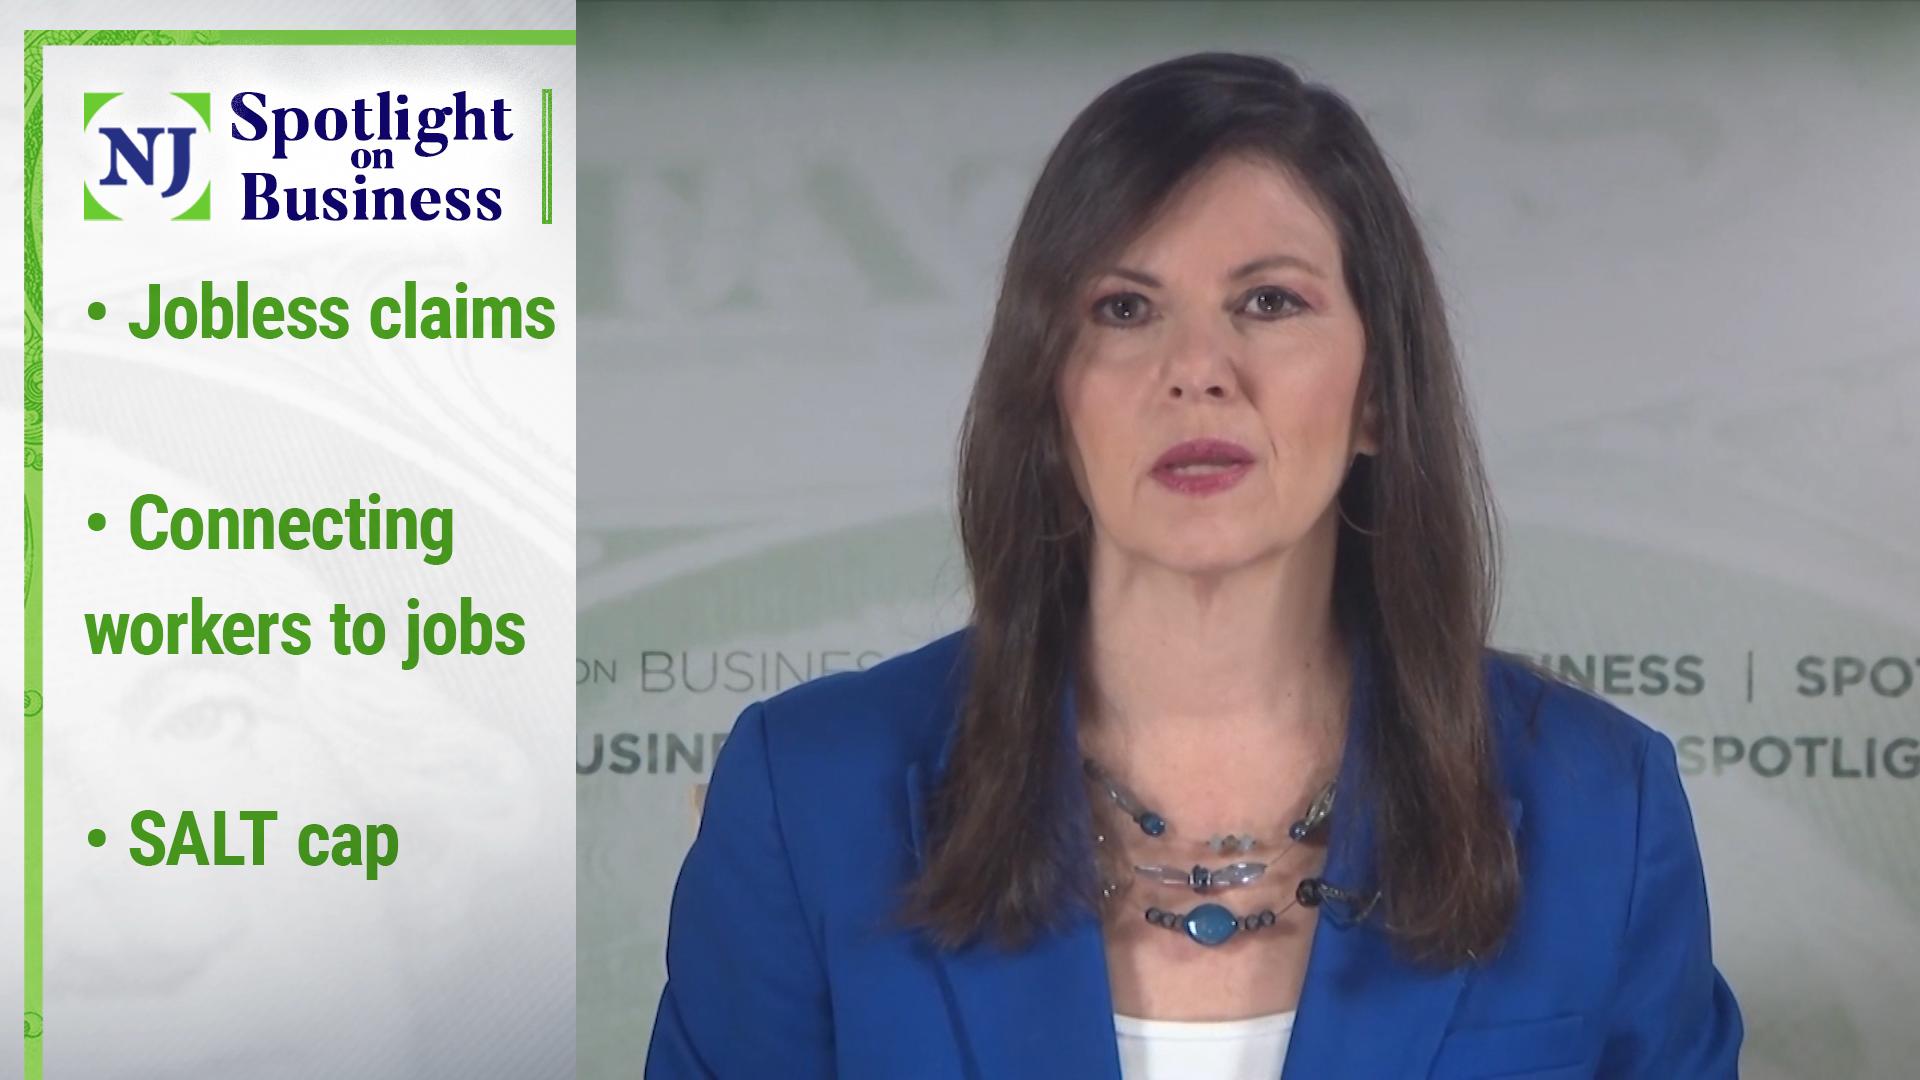 Annual Report: Unemployment Claims, Worker-to-Job Connection, SALT Upper Limit, Merck Process    Video